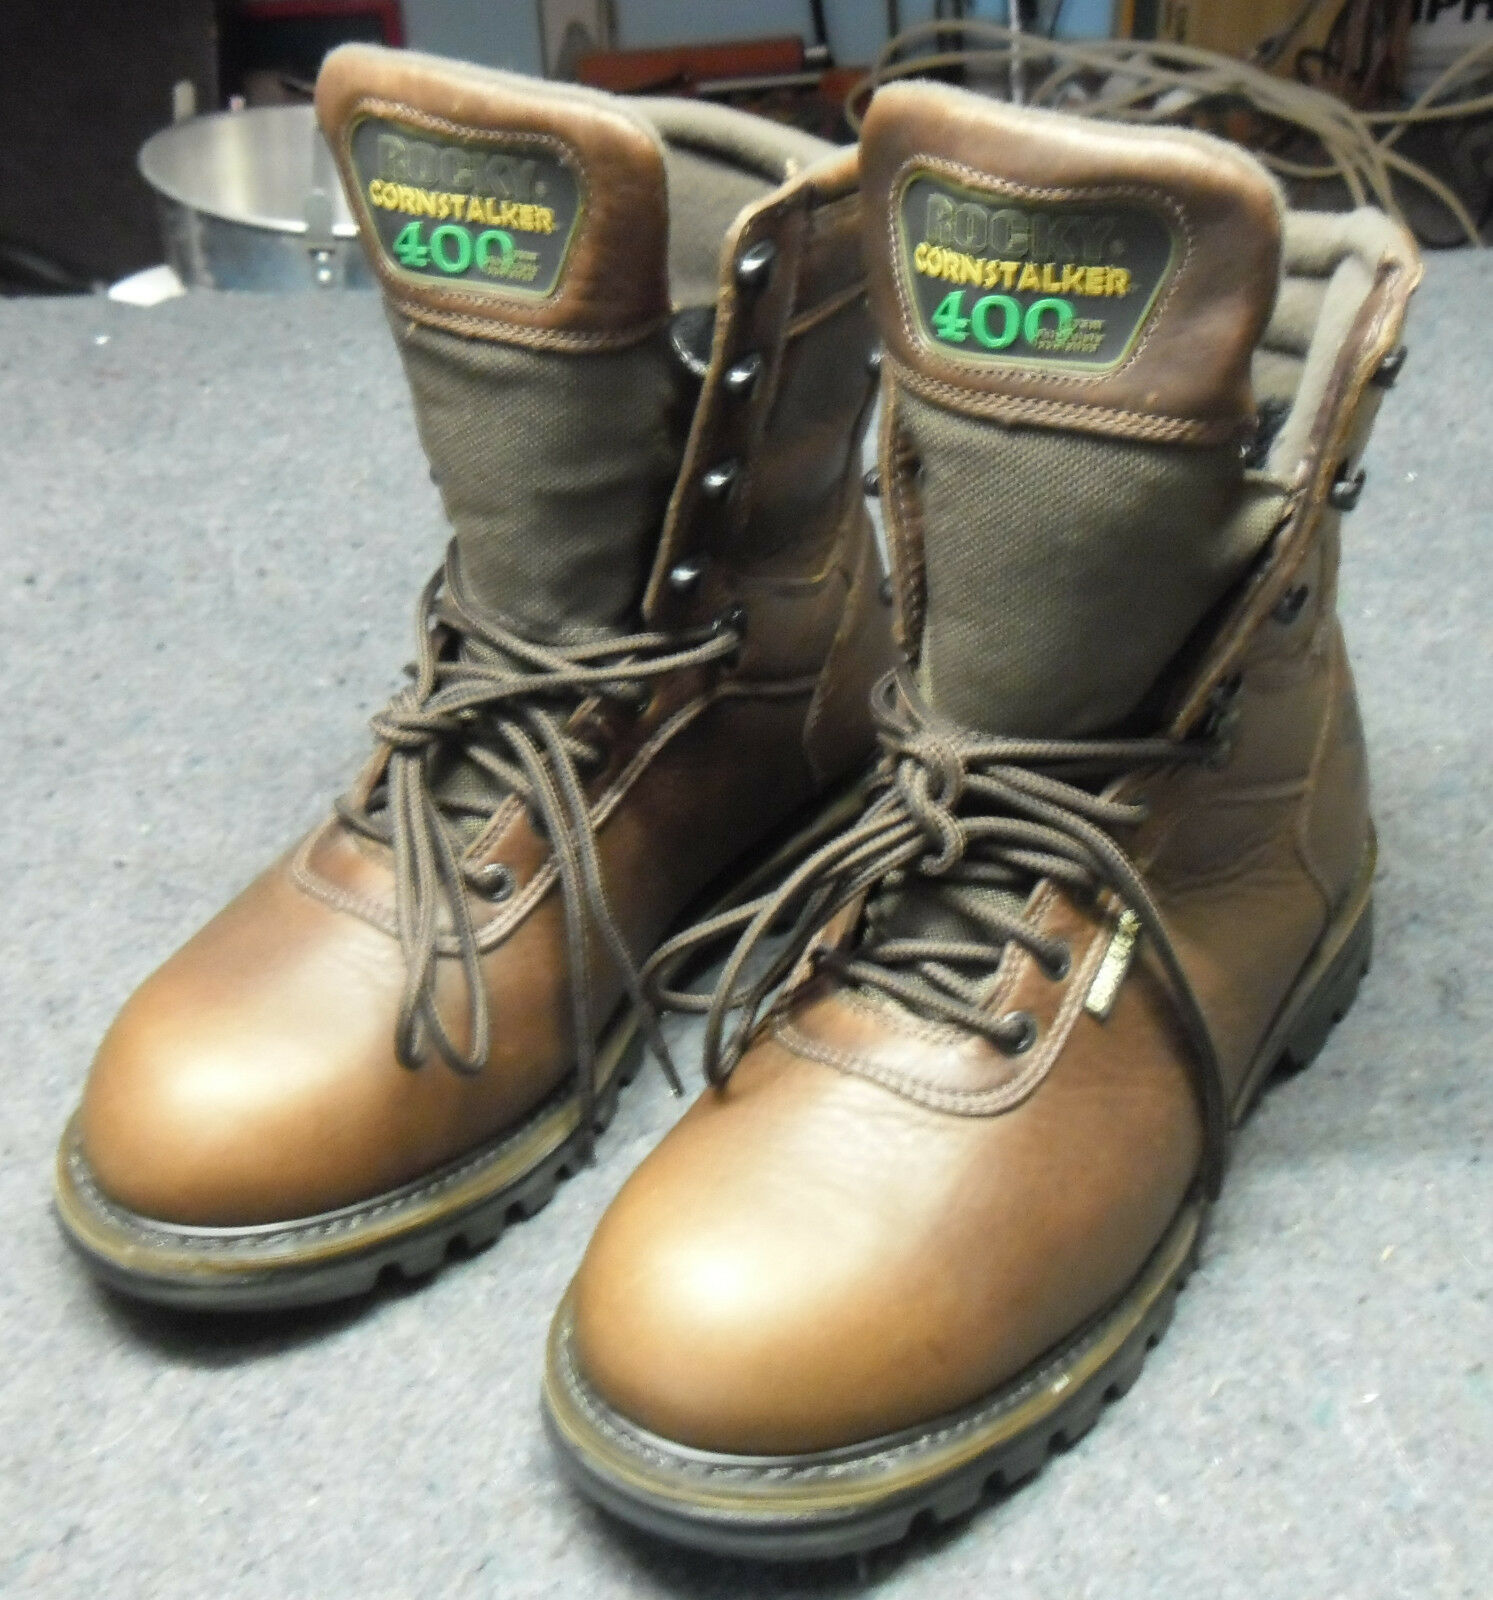 Mens Rocky Cornstalker 400 Gore-Tex Waterproof braun Hunting Hunting Hunting Stiefel Größe 11.5 NEW 0f2aa4